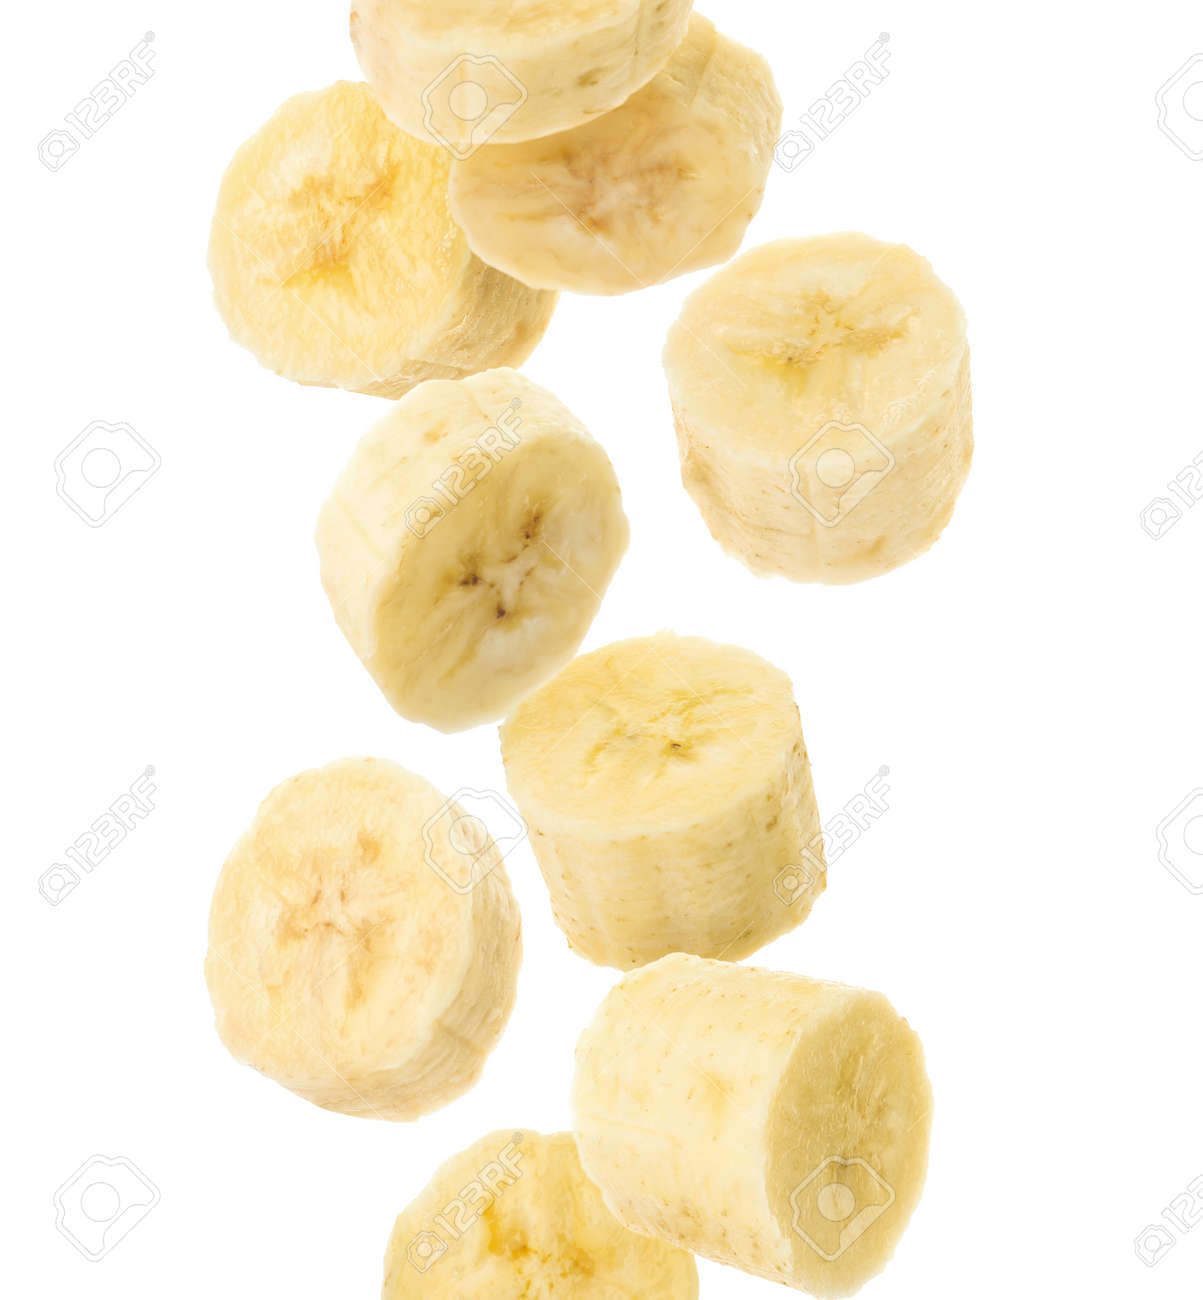 Slices of tasty ripe banana falling on white background - 165621289